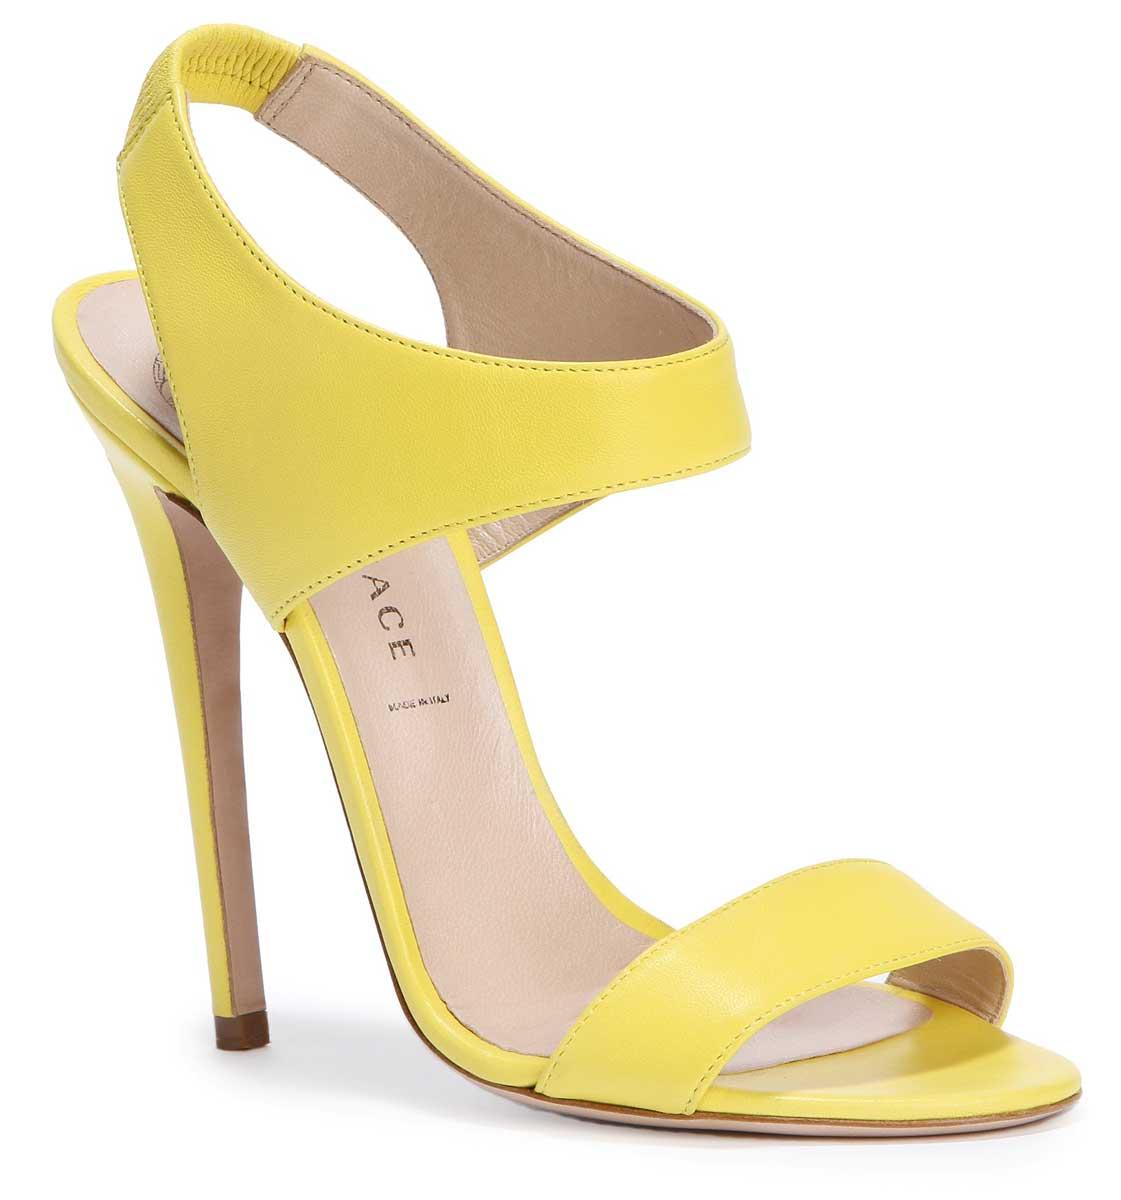 http://2.bp.blogspot.com/_E-uykHk4AyM/TU_kngtsIwI/AAAAAAAADyY/Q4-zWHcA9Gg/s1600/versace+spring+summer+2011+accessorises+%25285%2529.jpg